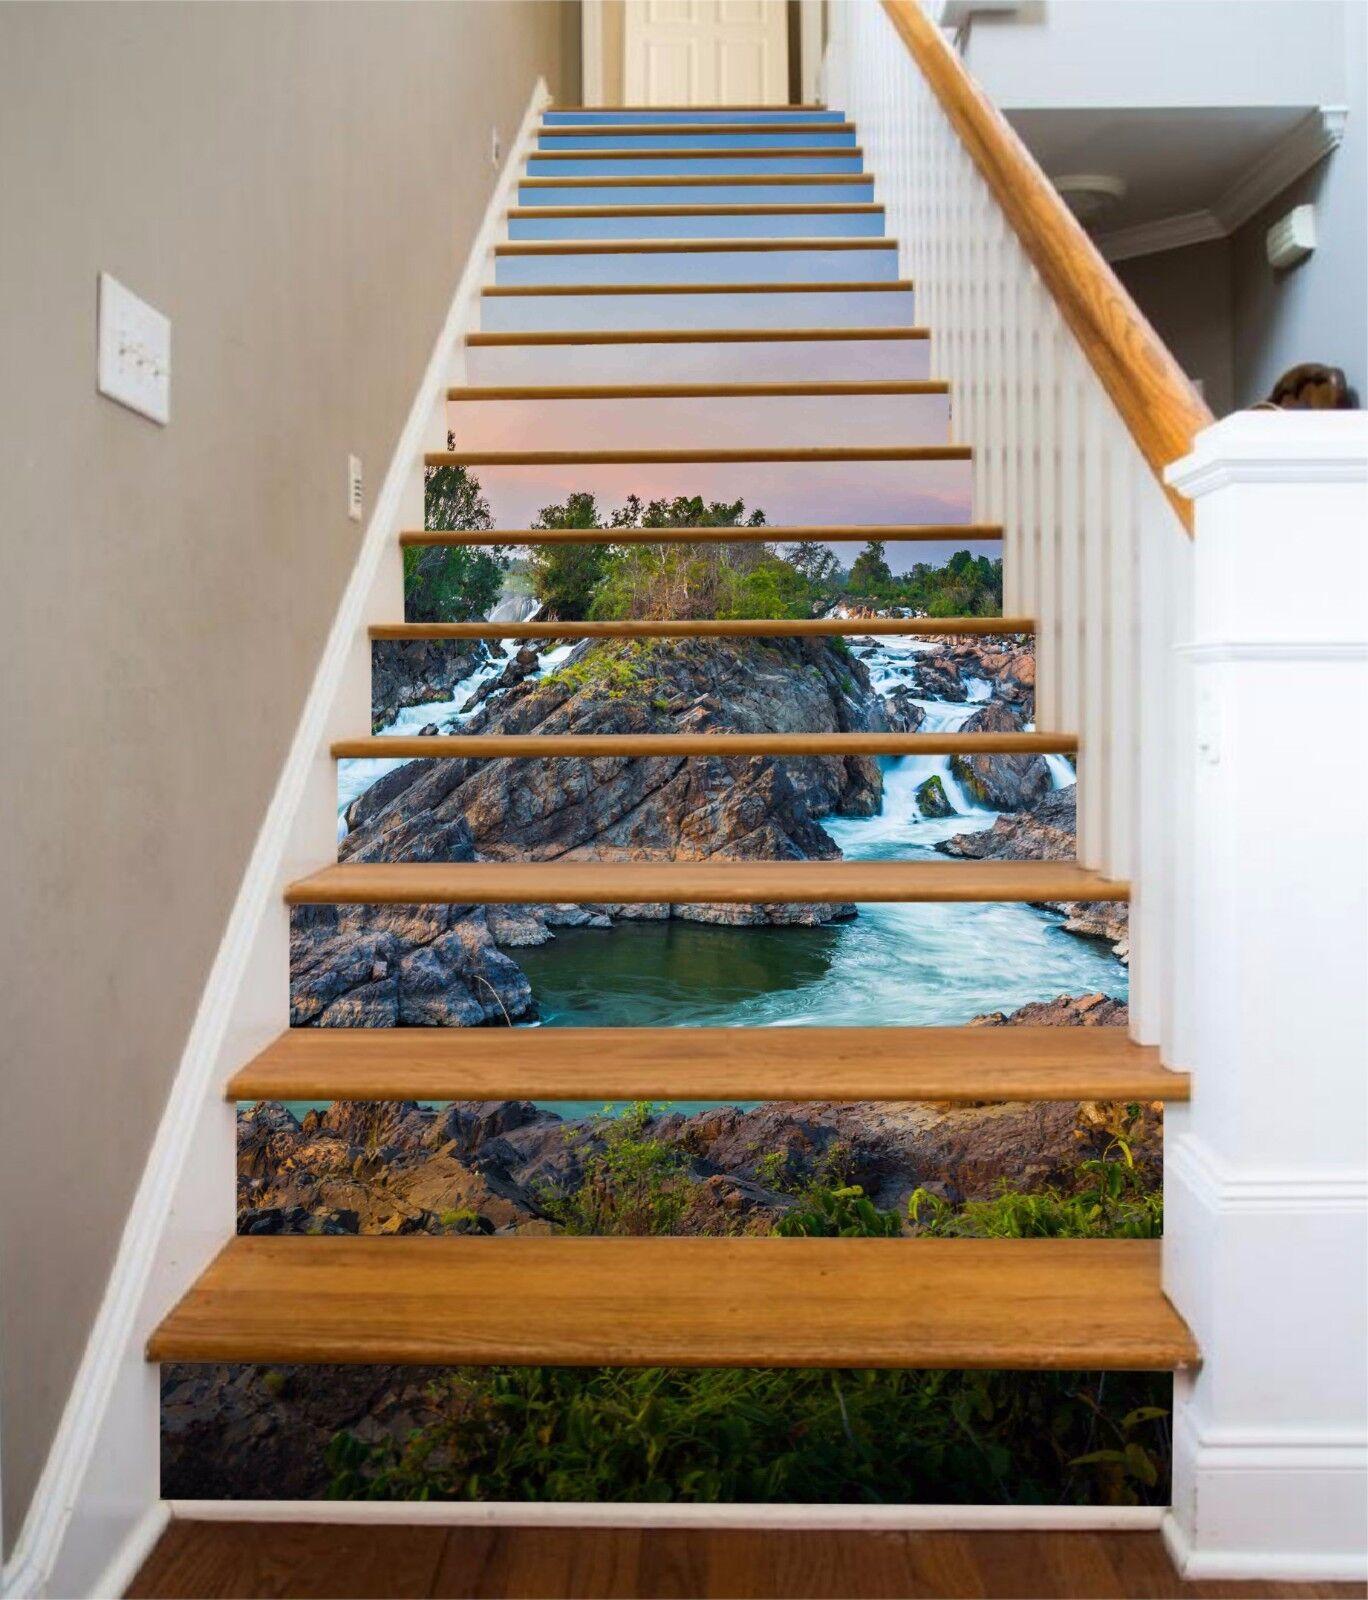 3D Sky stone 2 Stair Risers Decoration Photo Mural Vinyl Decal Wallpaper UK